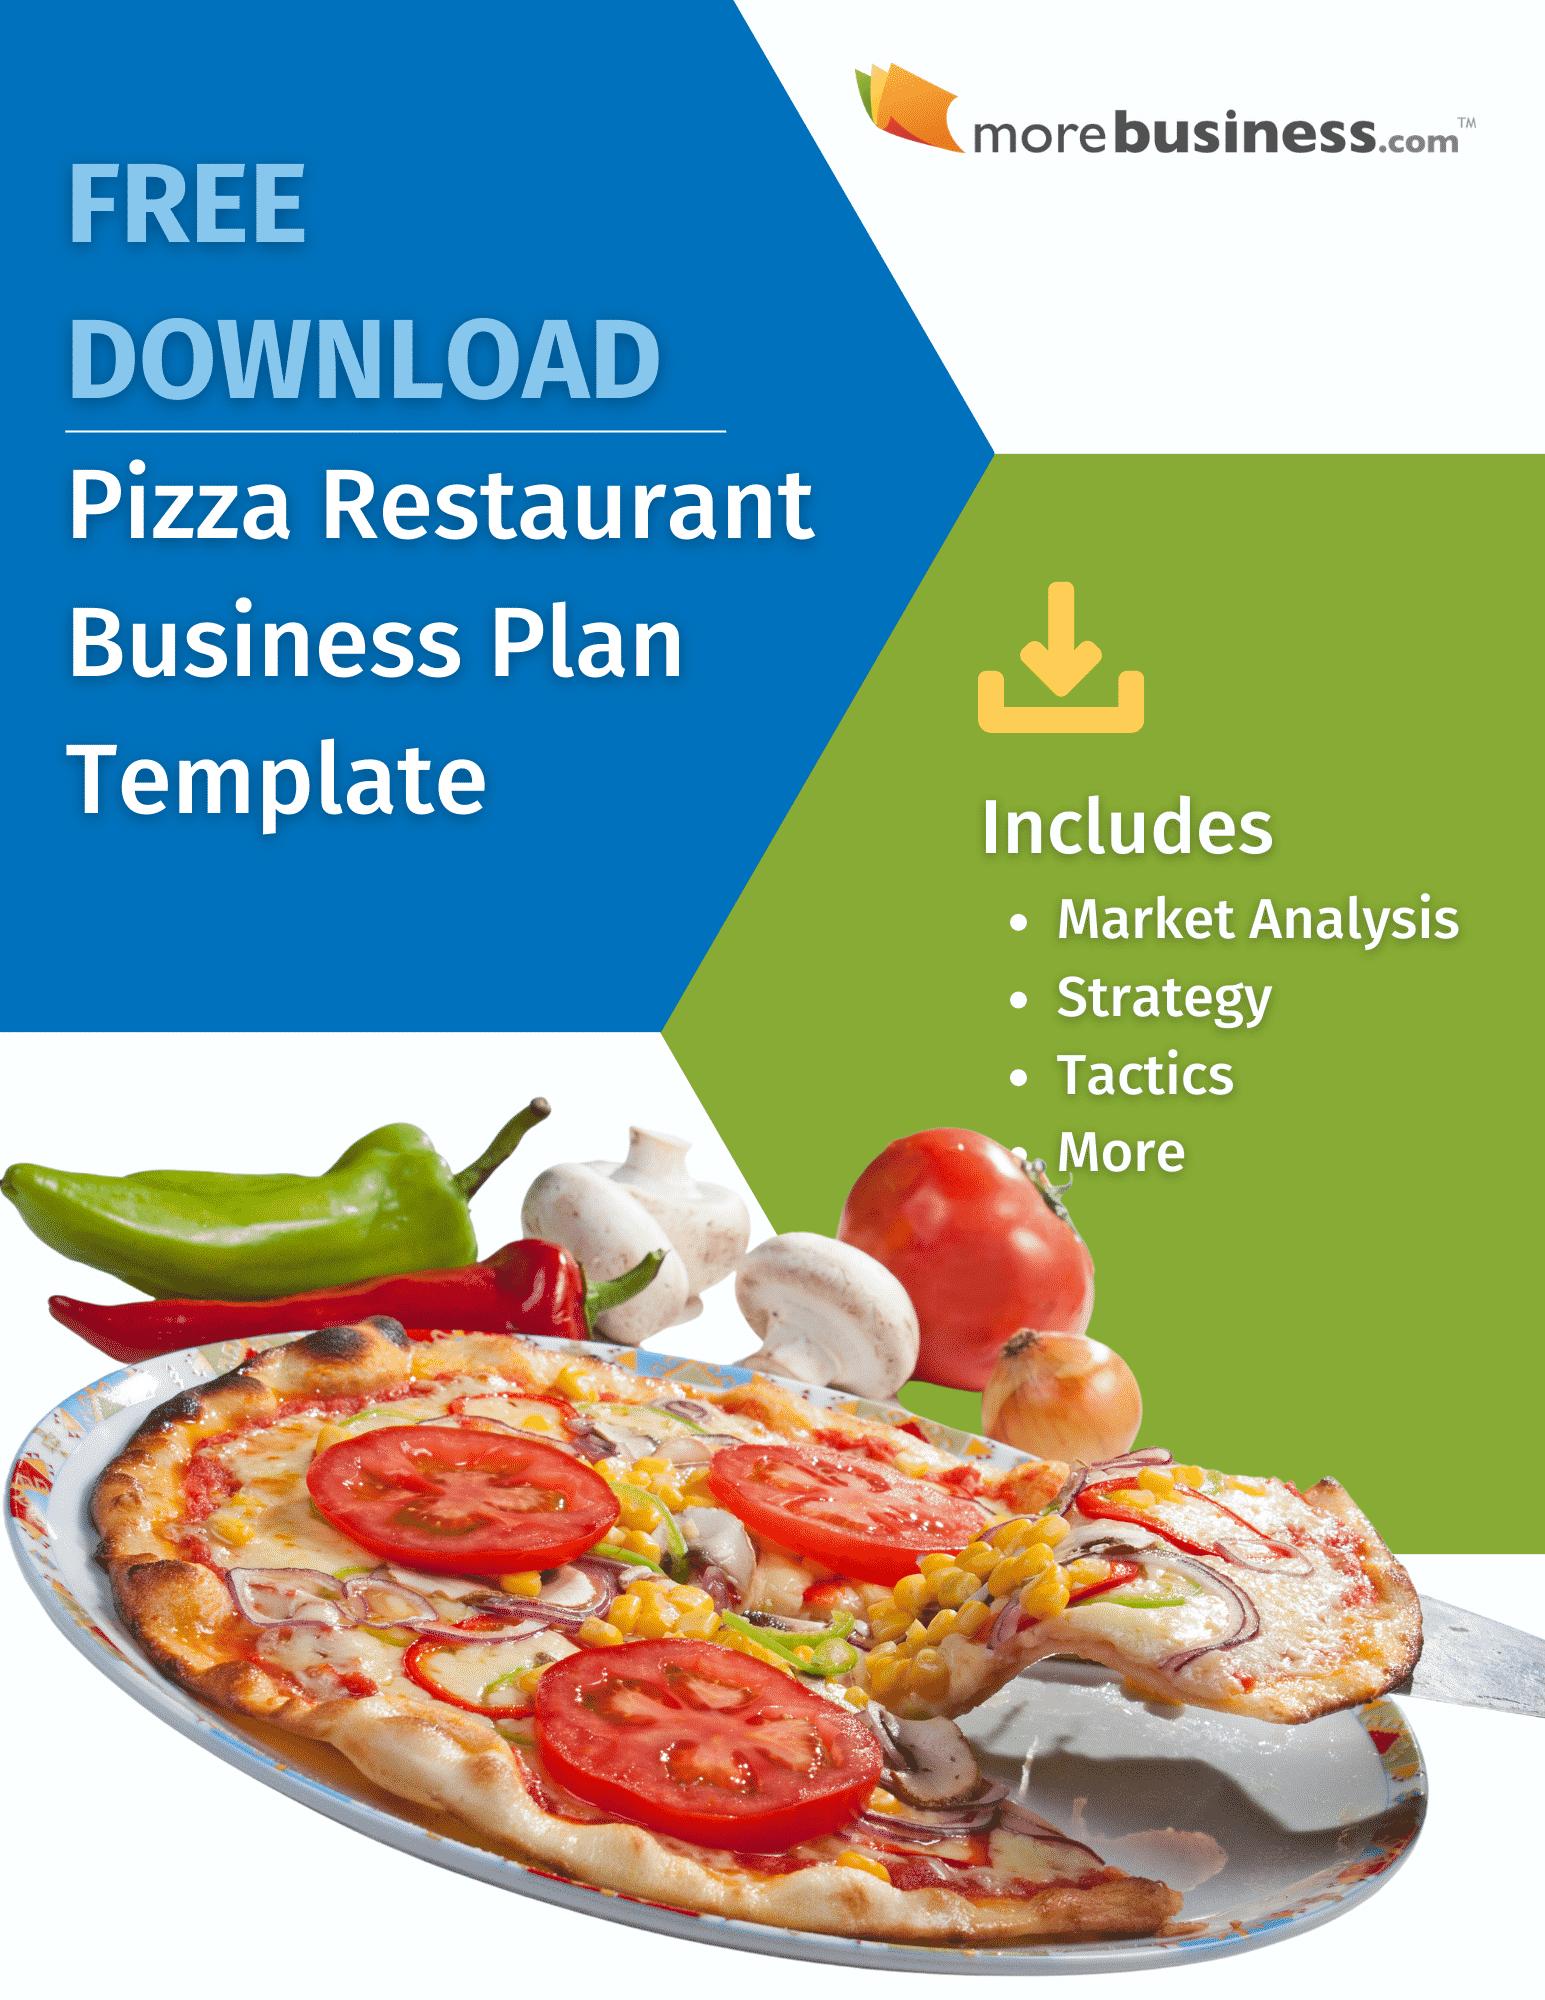 pizza restaurant business plan - free download